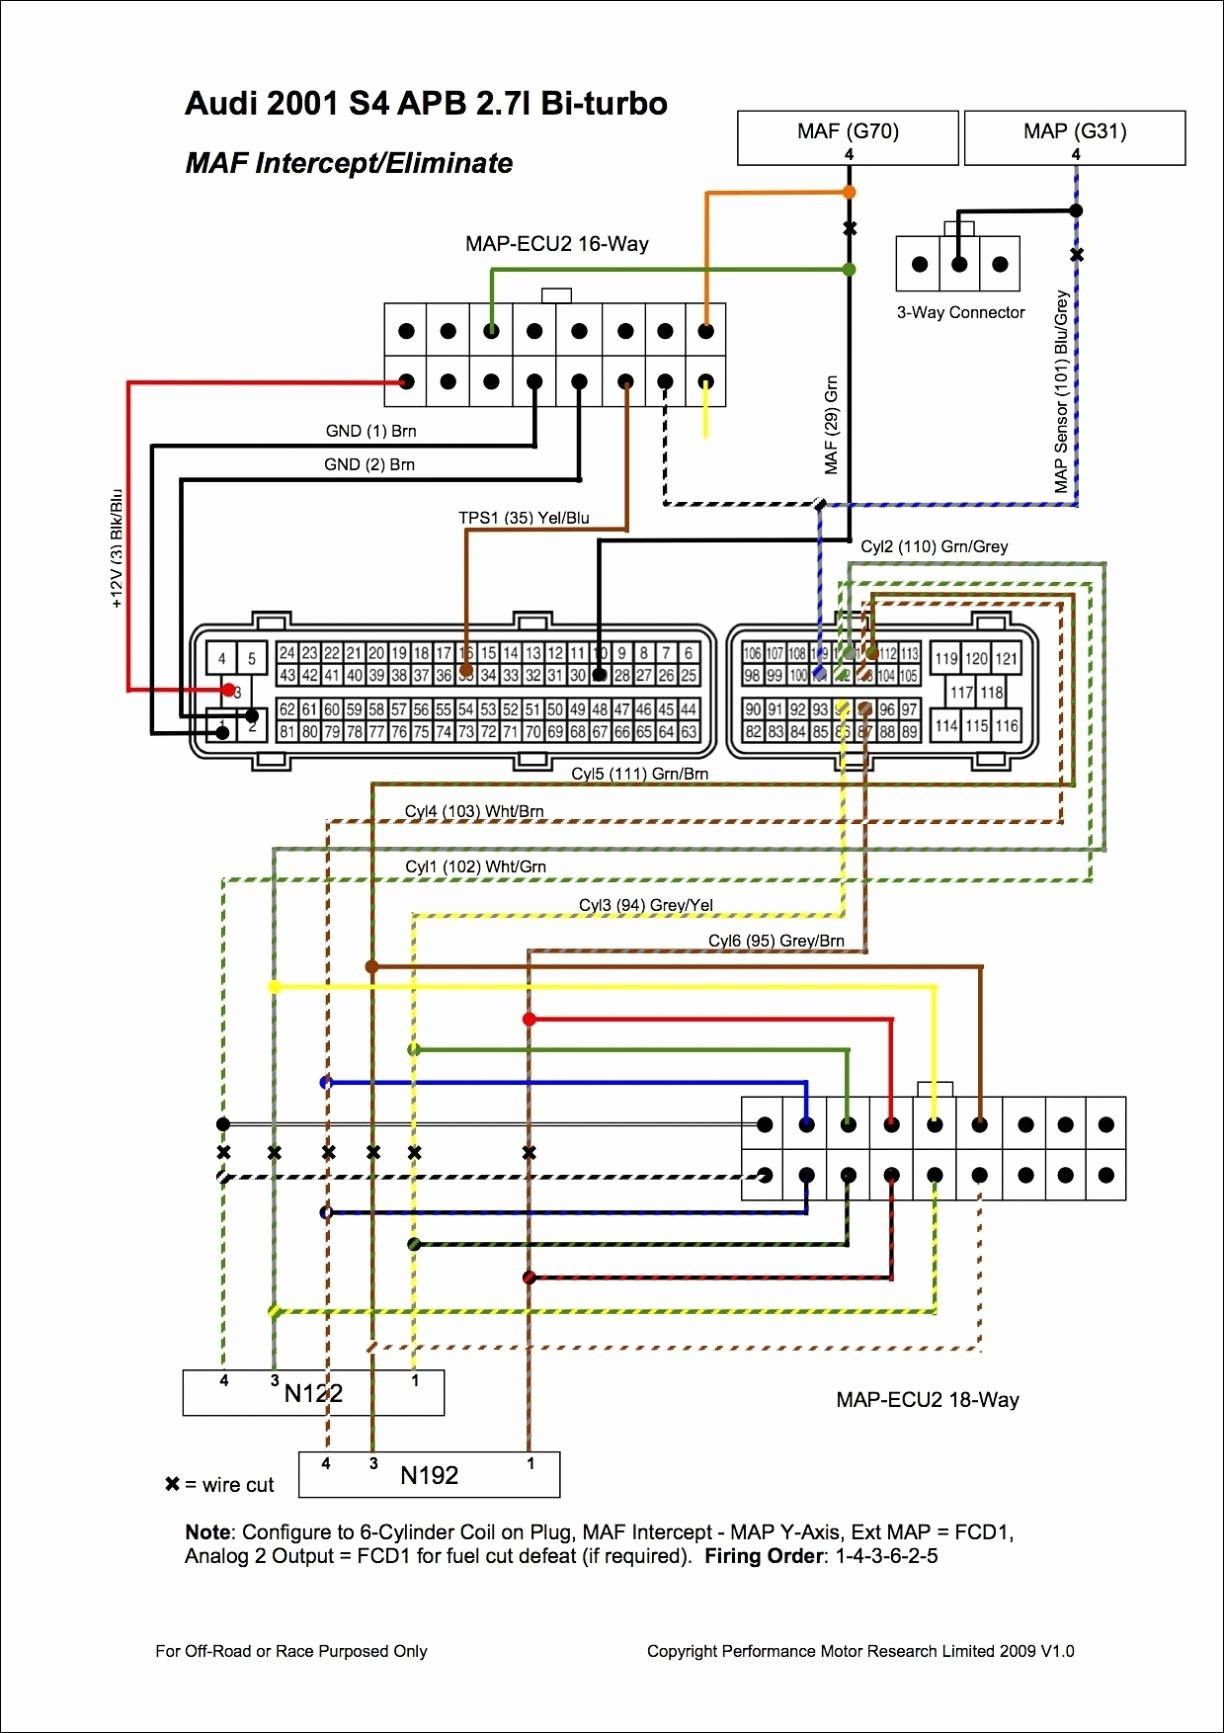 [DIAGRAM_38EU]  RN_2046] Wiring Diagram Deh 1100Mp Get Free Image About Wiring Diagram  Schematic Wiring | Wiring Diagram Pioneer Deh 34 |  | Mecad Trons Mohammedshrine Librar Wiring 101